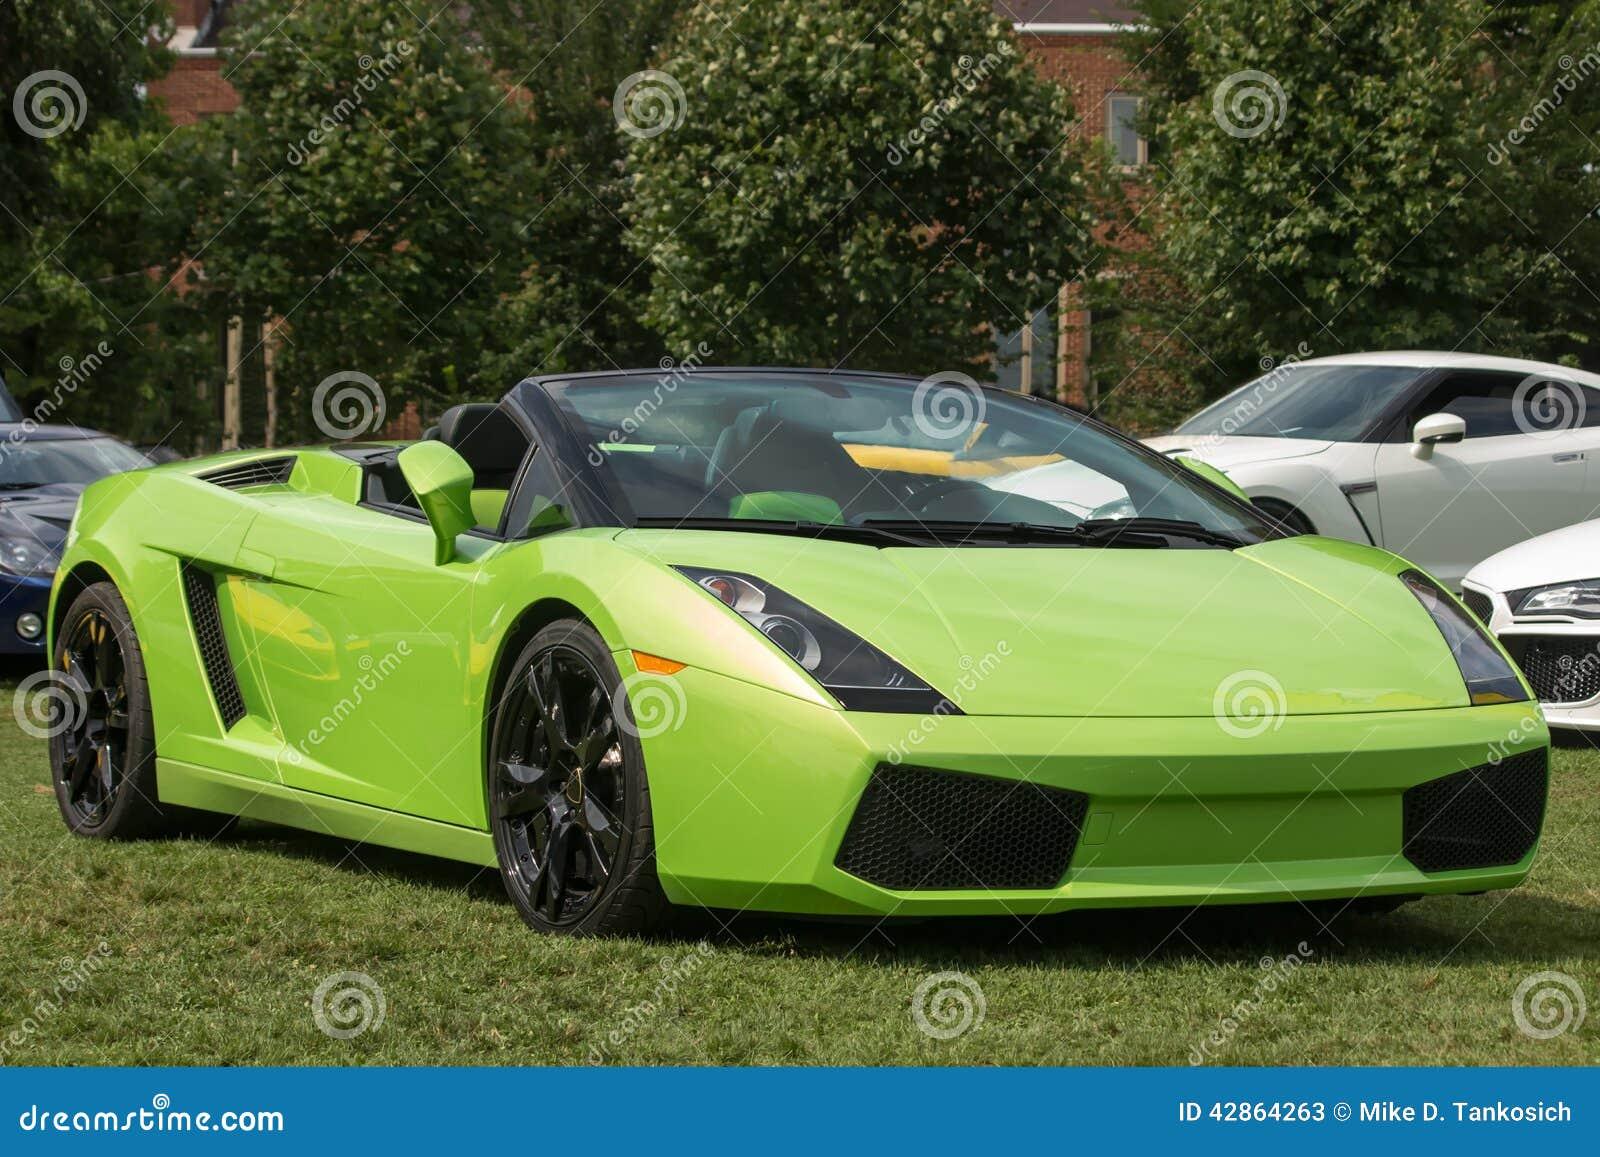 Cuvy Automobiles : lime green sports car right side stock image image 42864263 ~ Gottalentnigeria.com Avis de Voitures